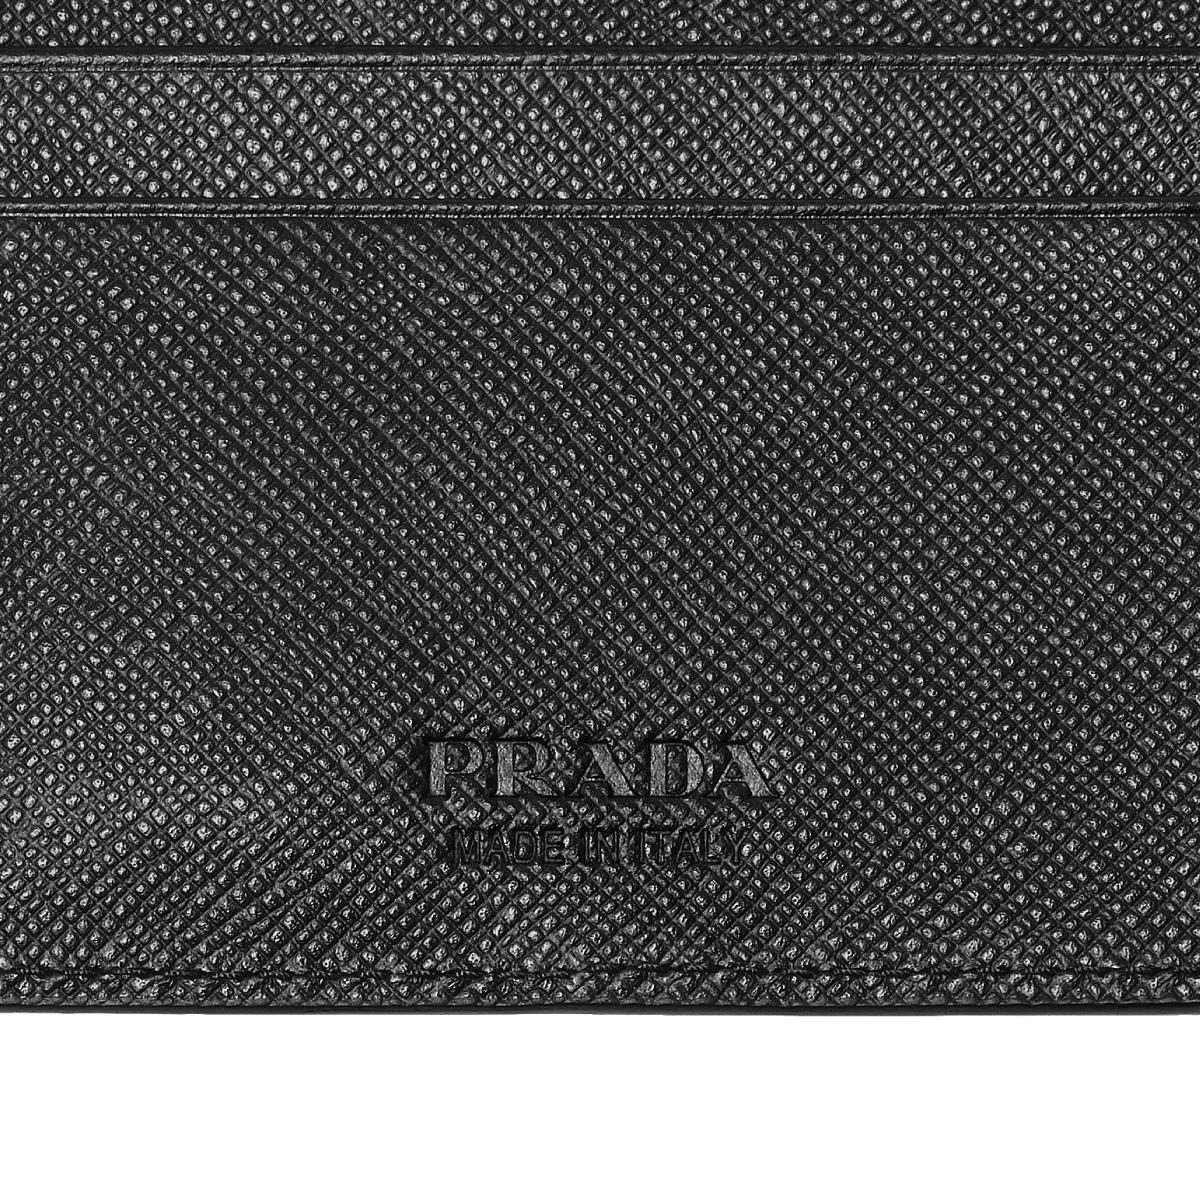 e02e0f1ad501 ... Prada PRADA wallet men 2MN077 QME F0002 folio wallet SAFFIANO METAL  NERO black ...